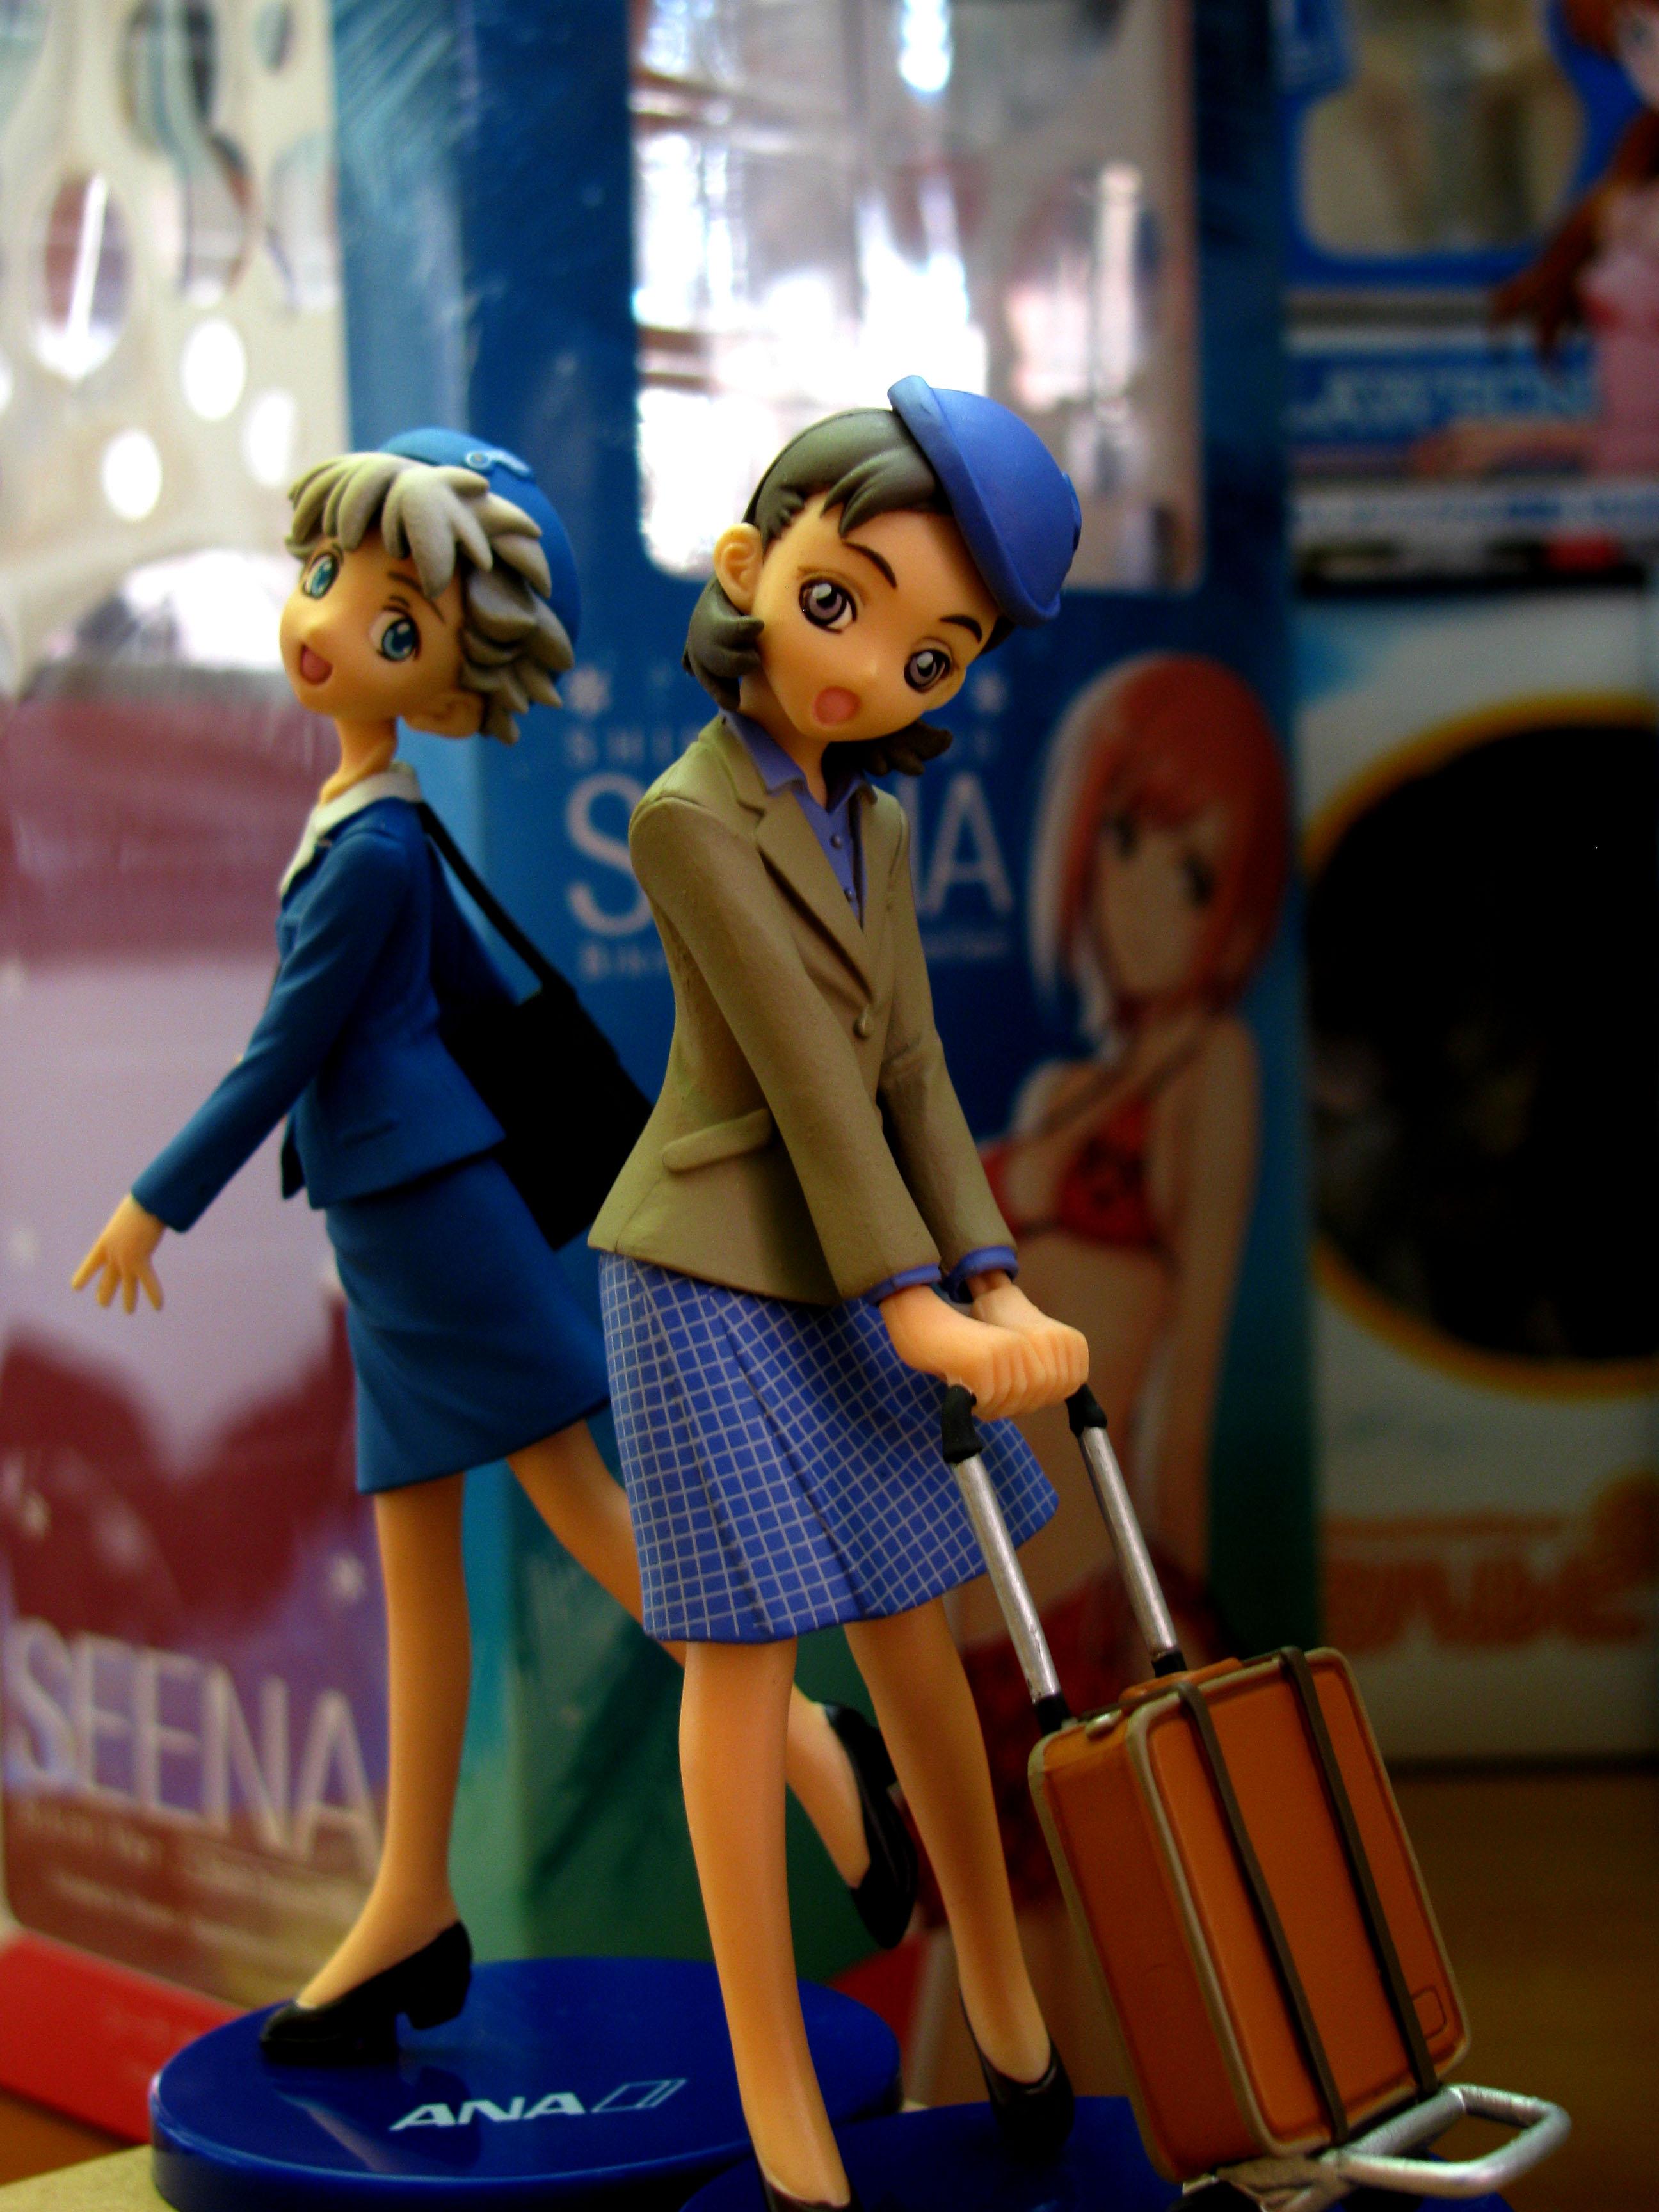 uniform bag female kaiyodo fly pretty ana anniversary trading_figure hostess luggage flying_company